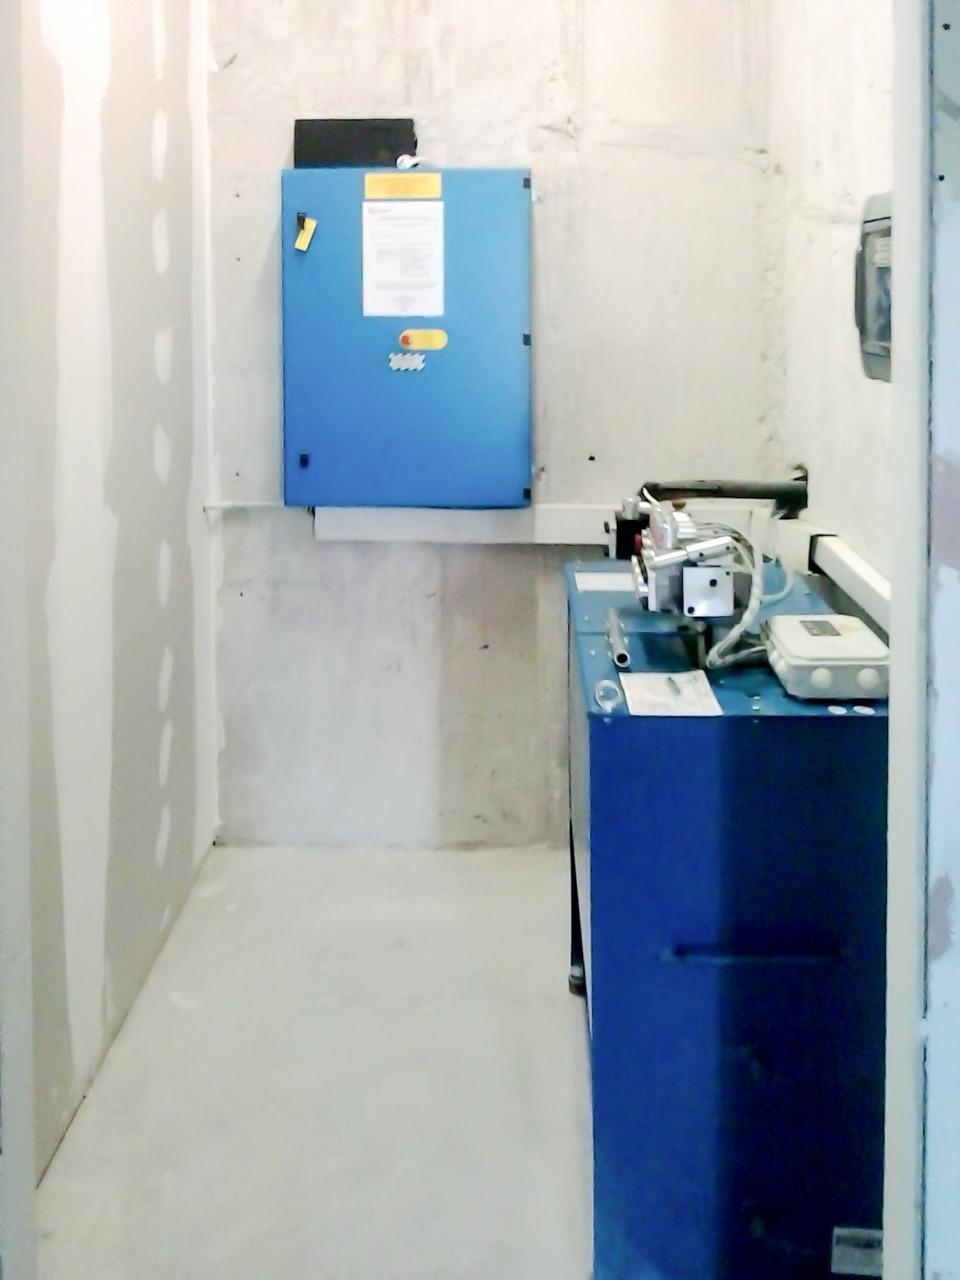 zlift-erga-lifts-12 Εγκατάσταση Ανελκυστήρα - Ρόδος